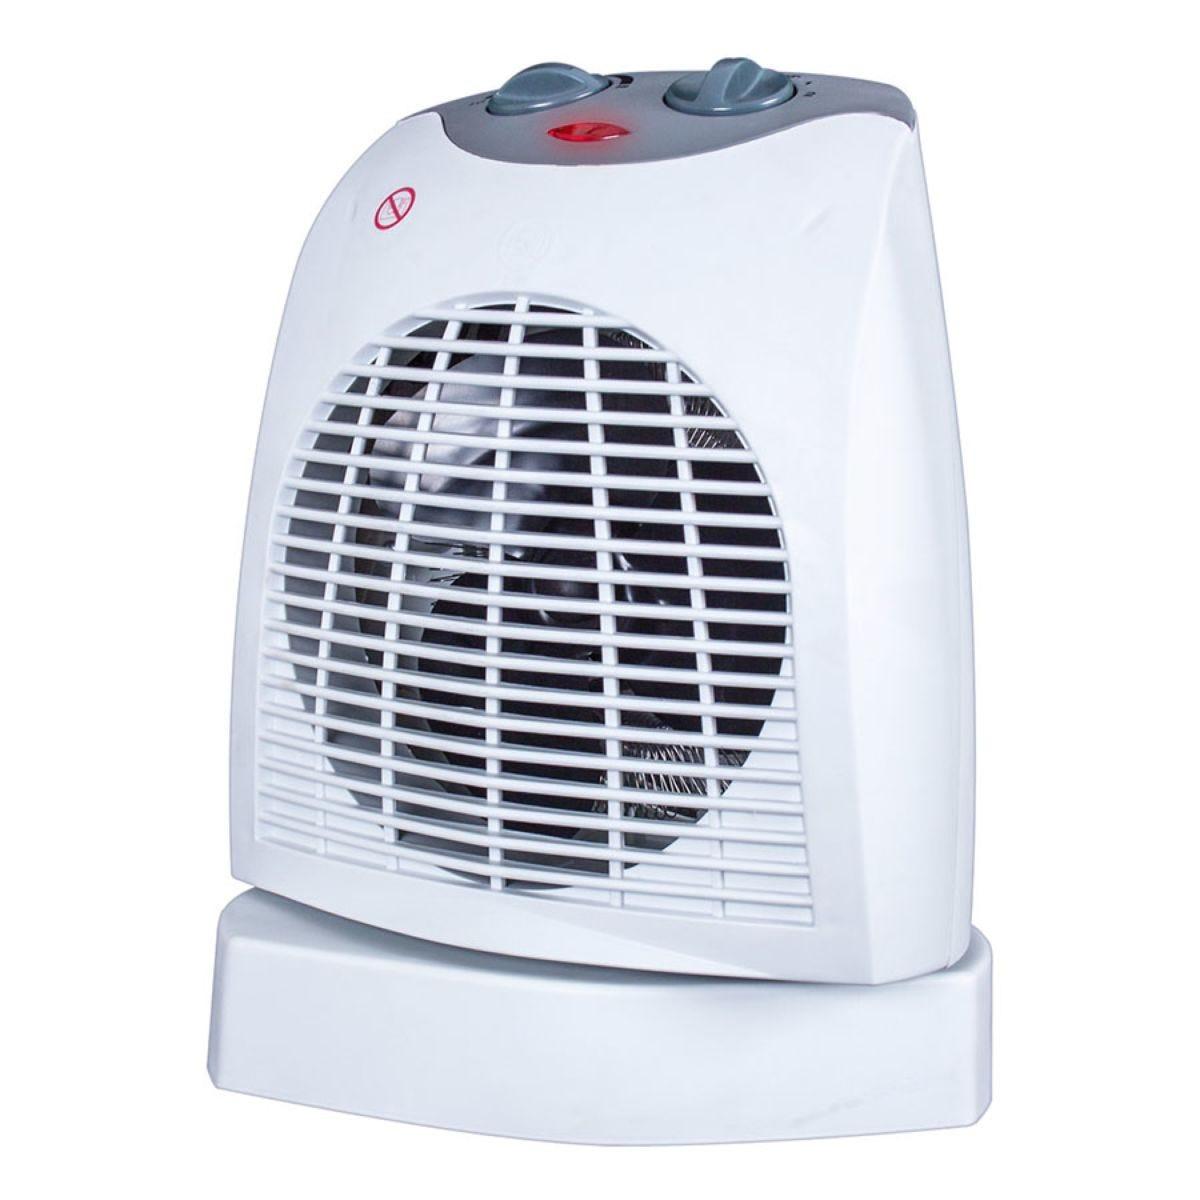 Silentnight 2kW 90° Oscillating Fan Heater